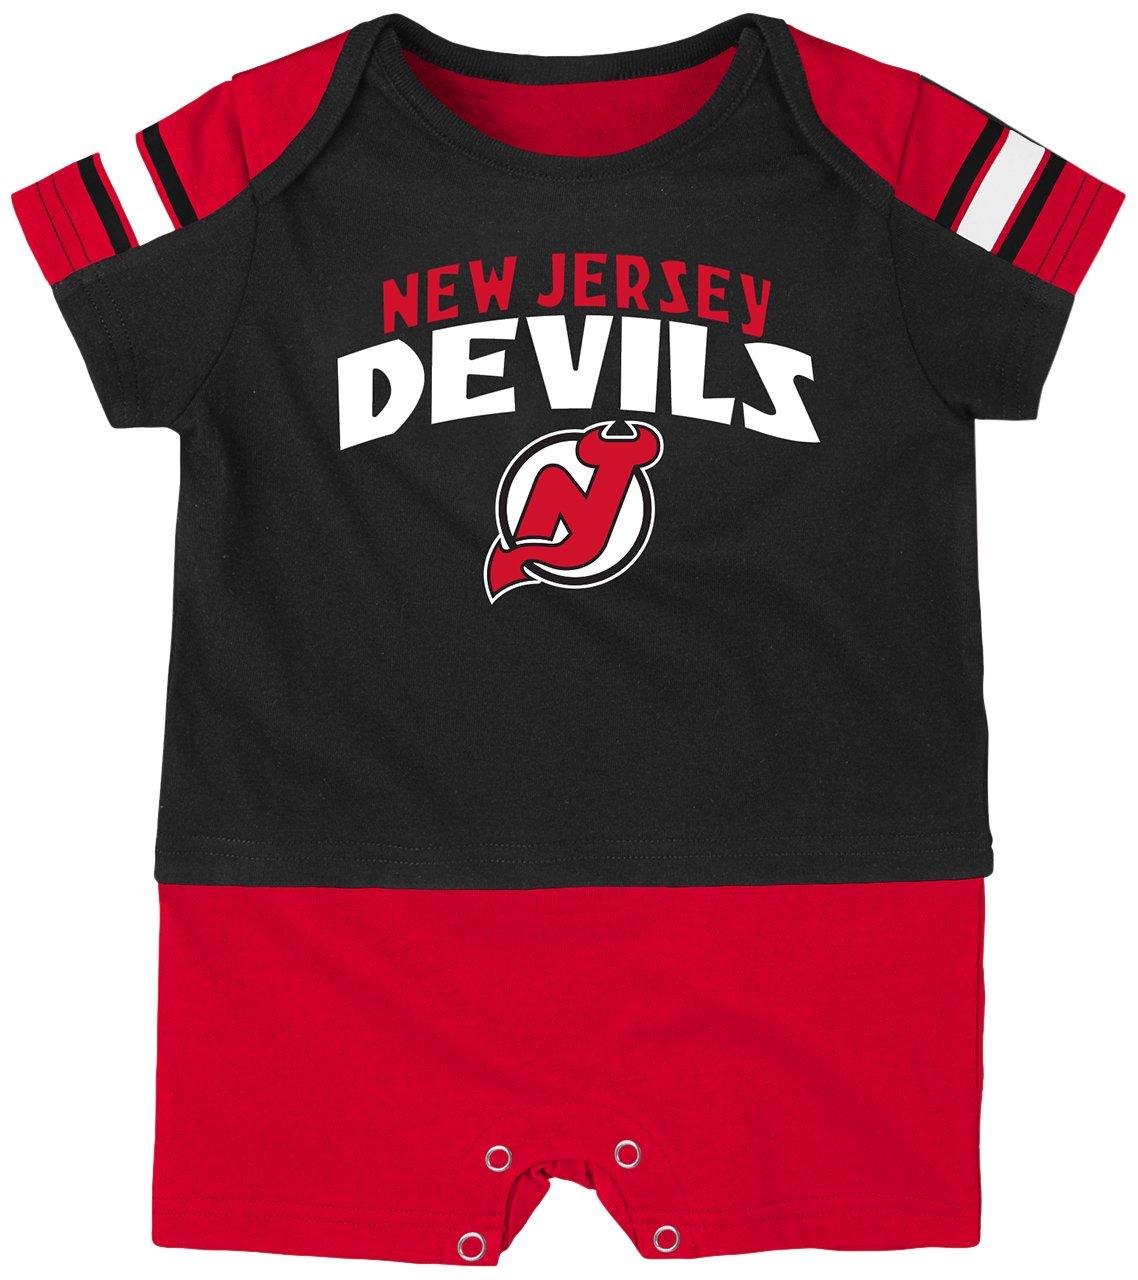 贅沢 NHL男の子新生児&乳児